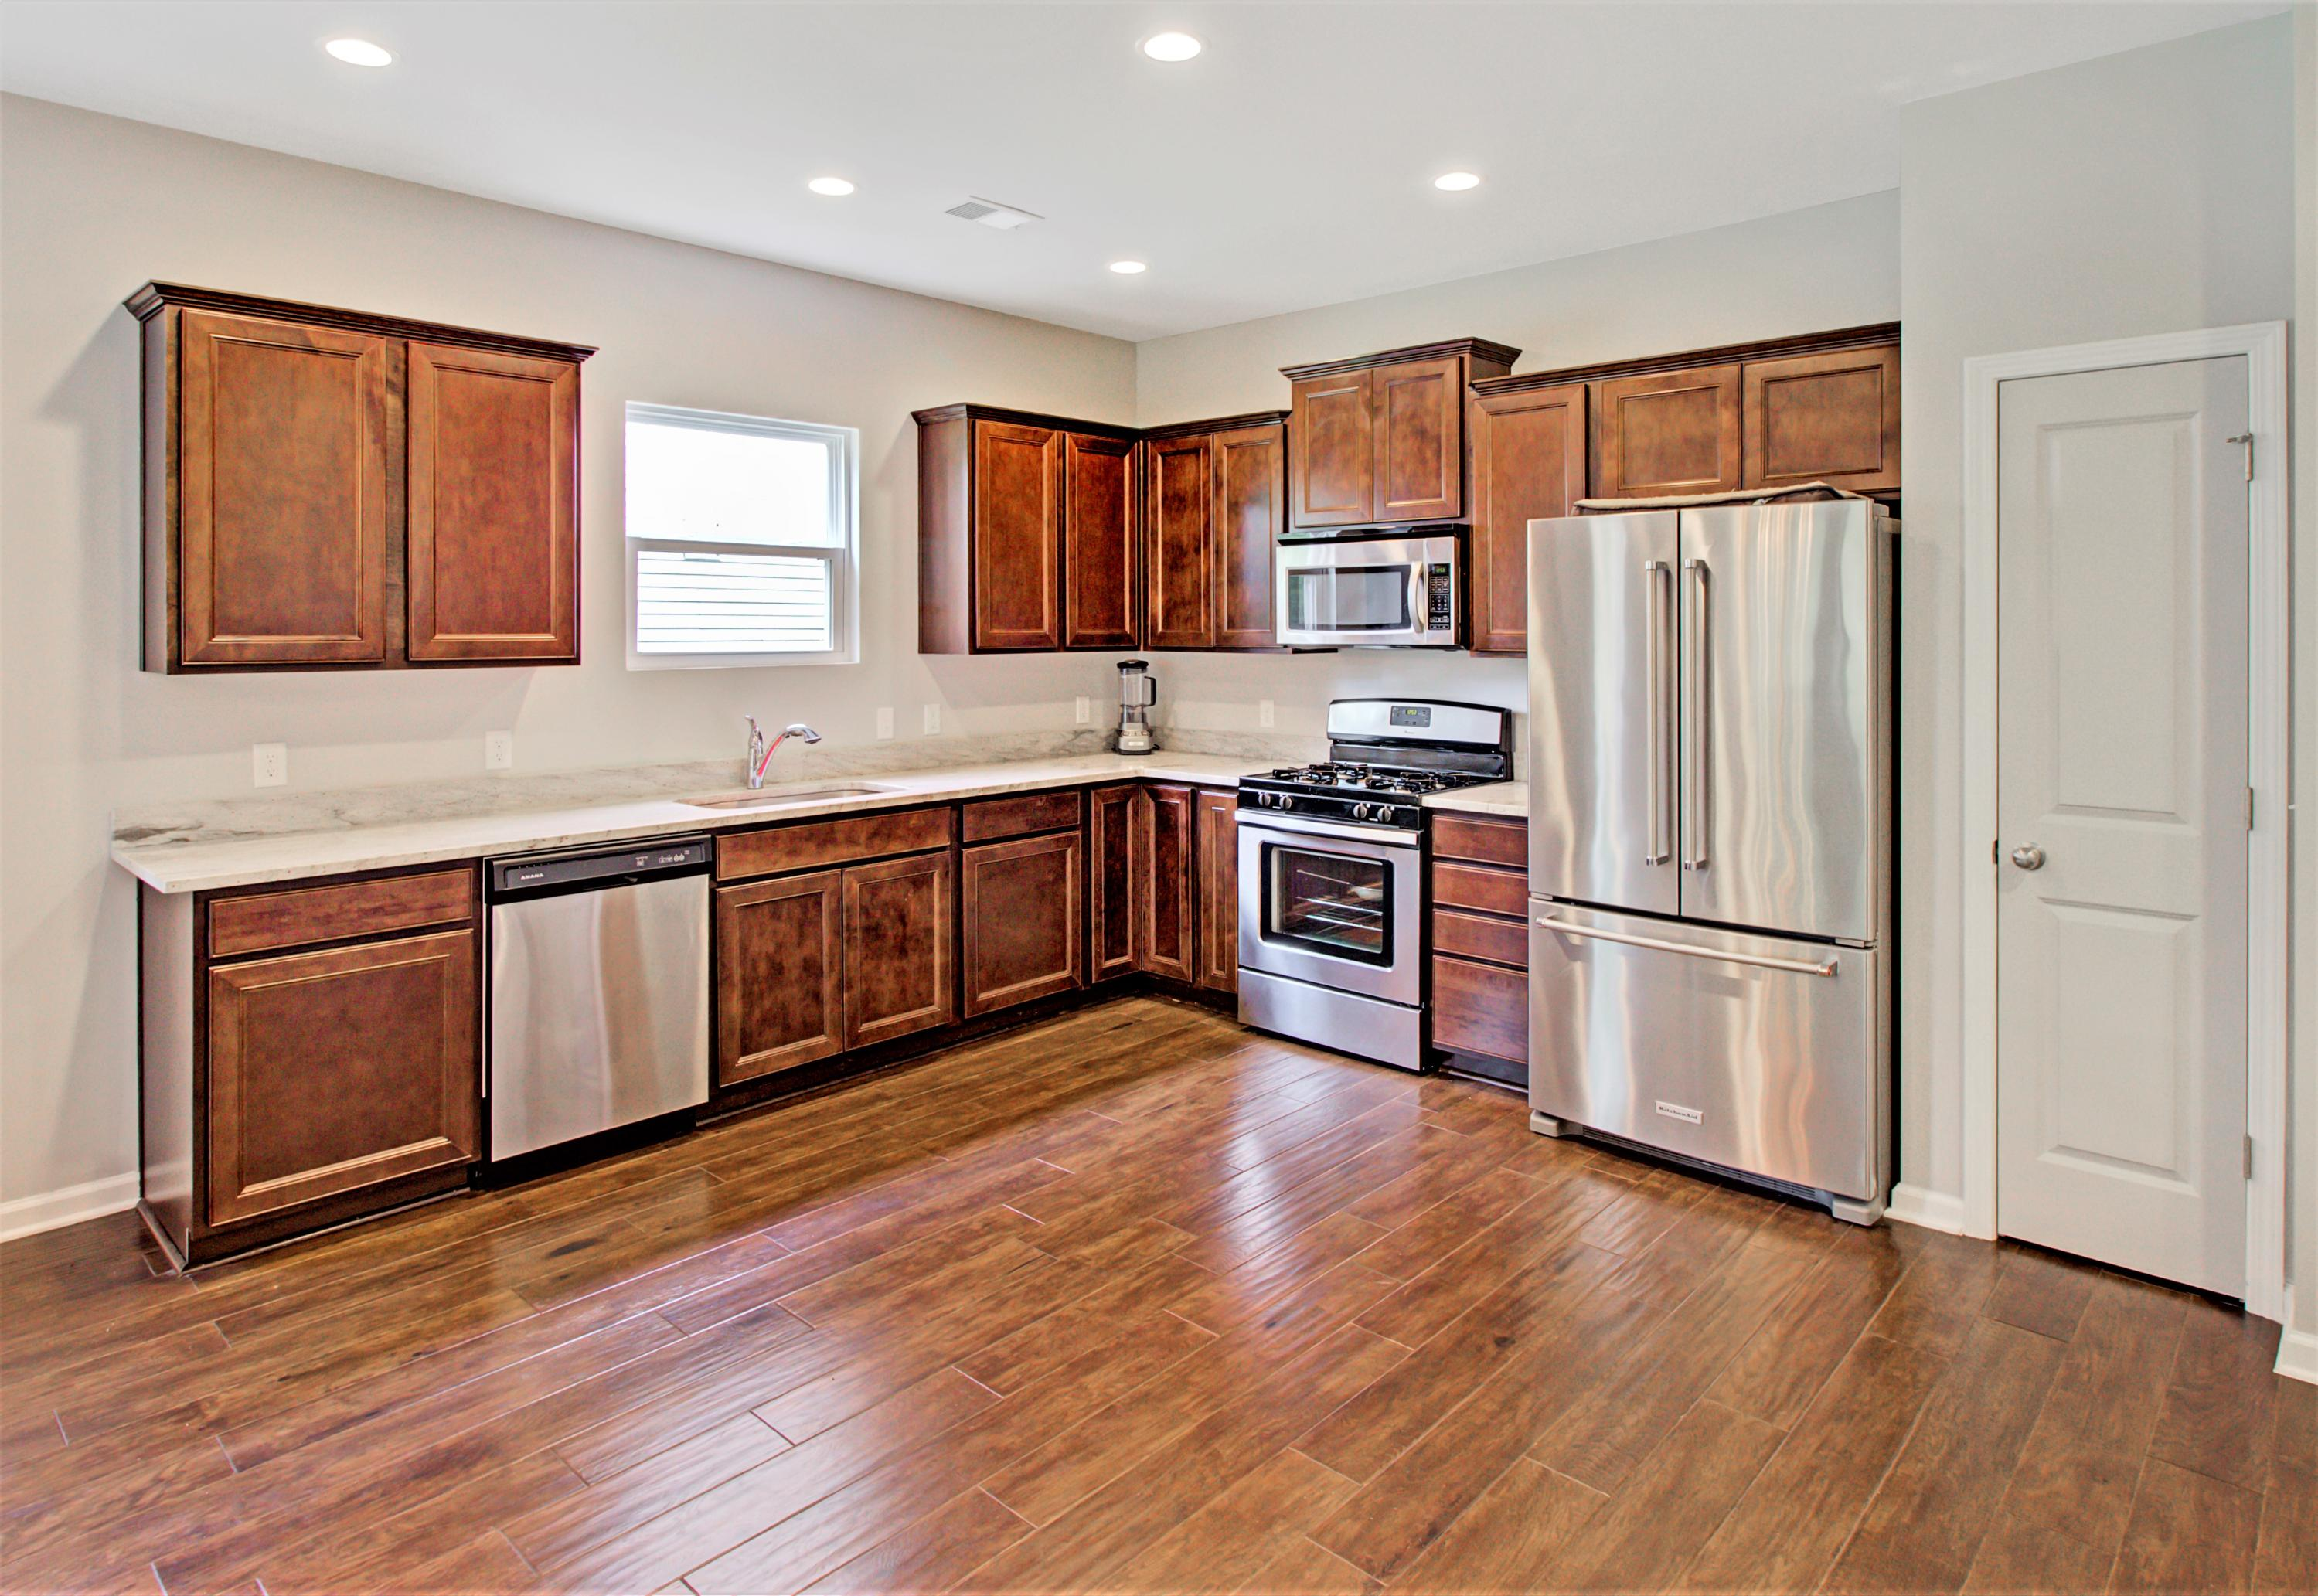 Carolina Bay Homes For Sale - 3063 Conservancy, Charleston, SC - 7